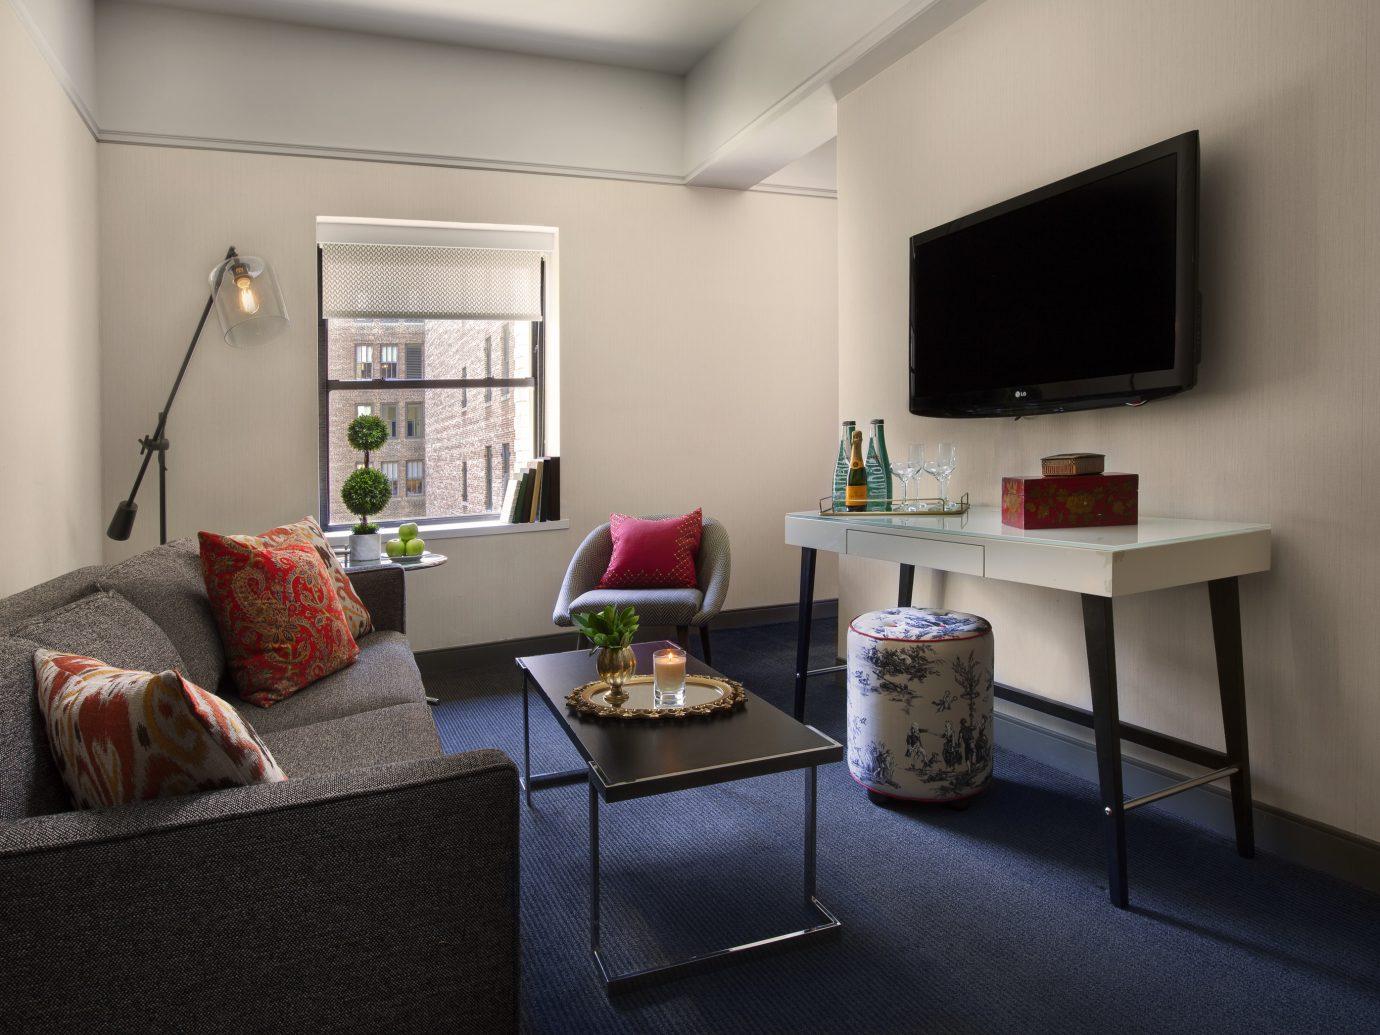 Living room at The Redbury, New York City